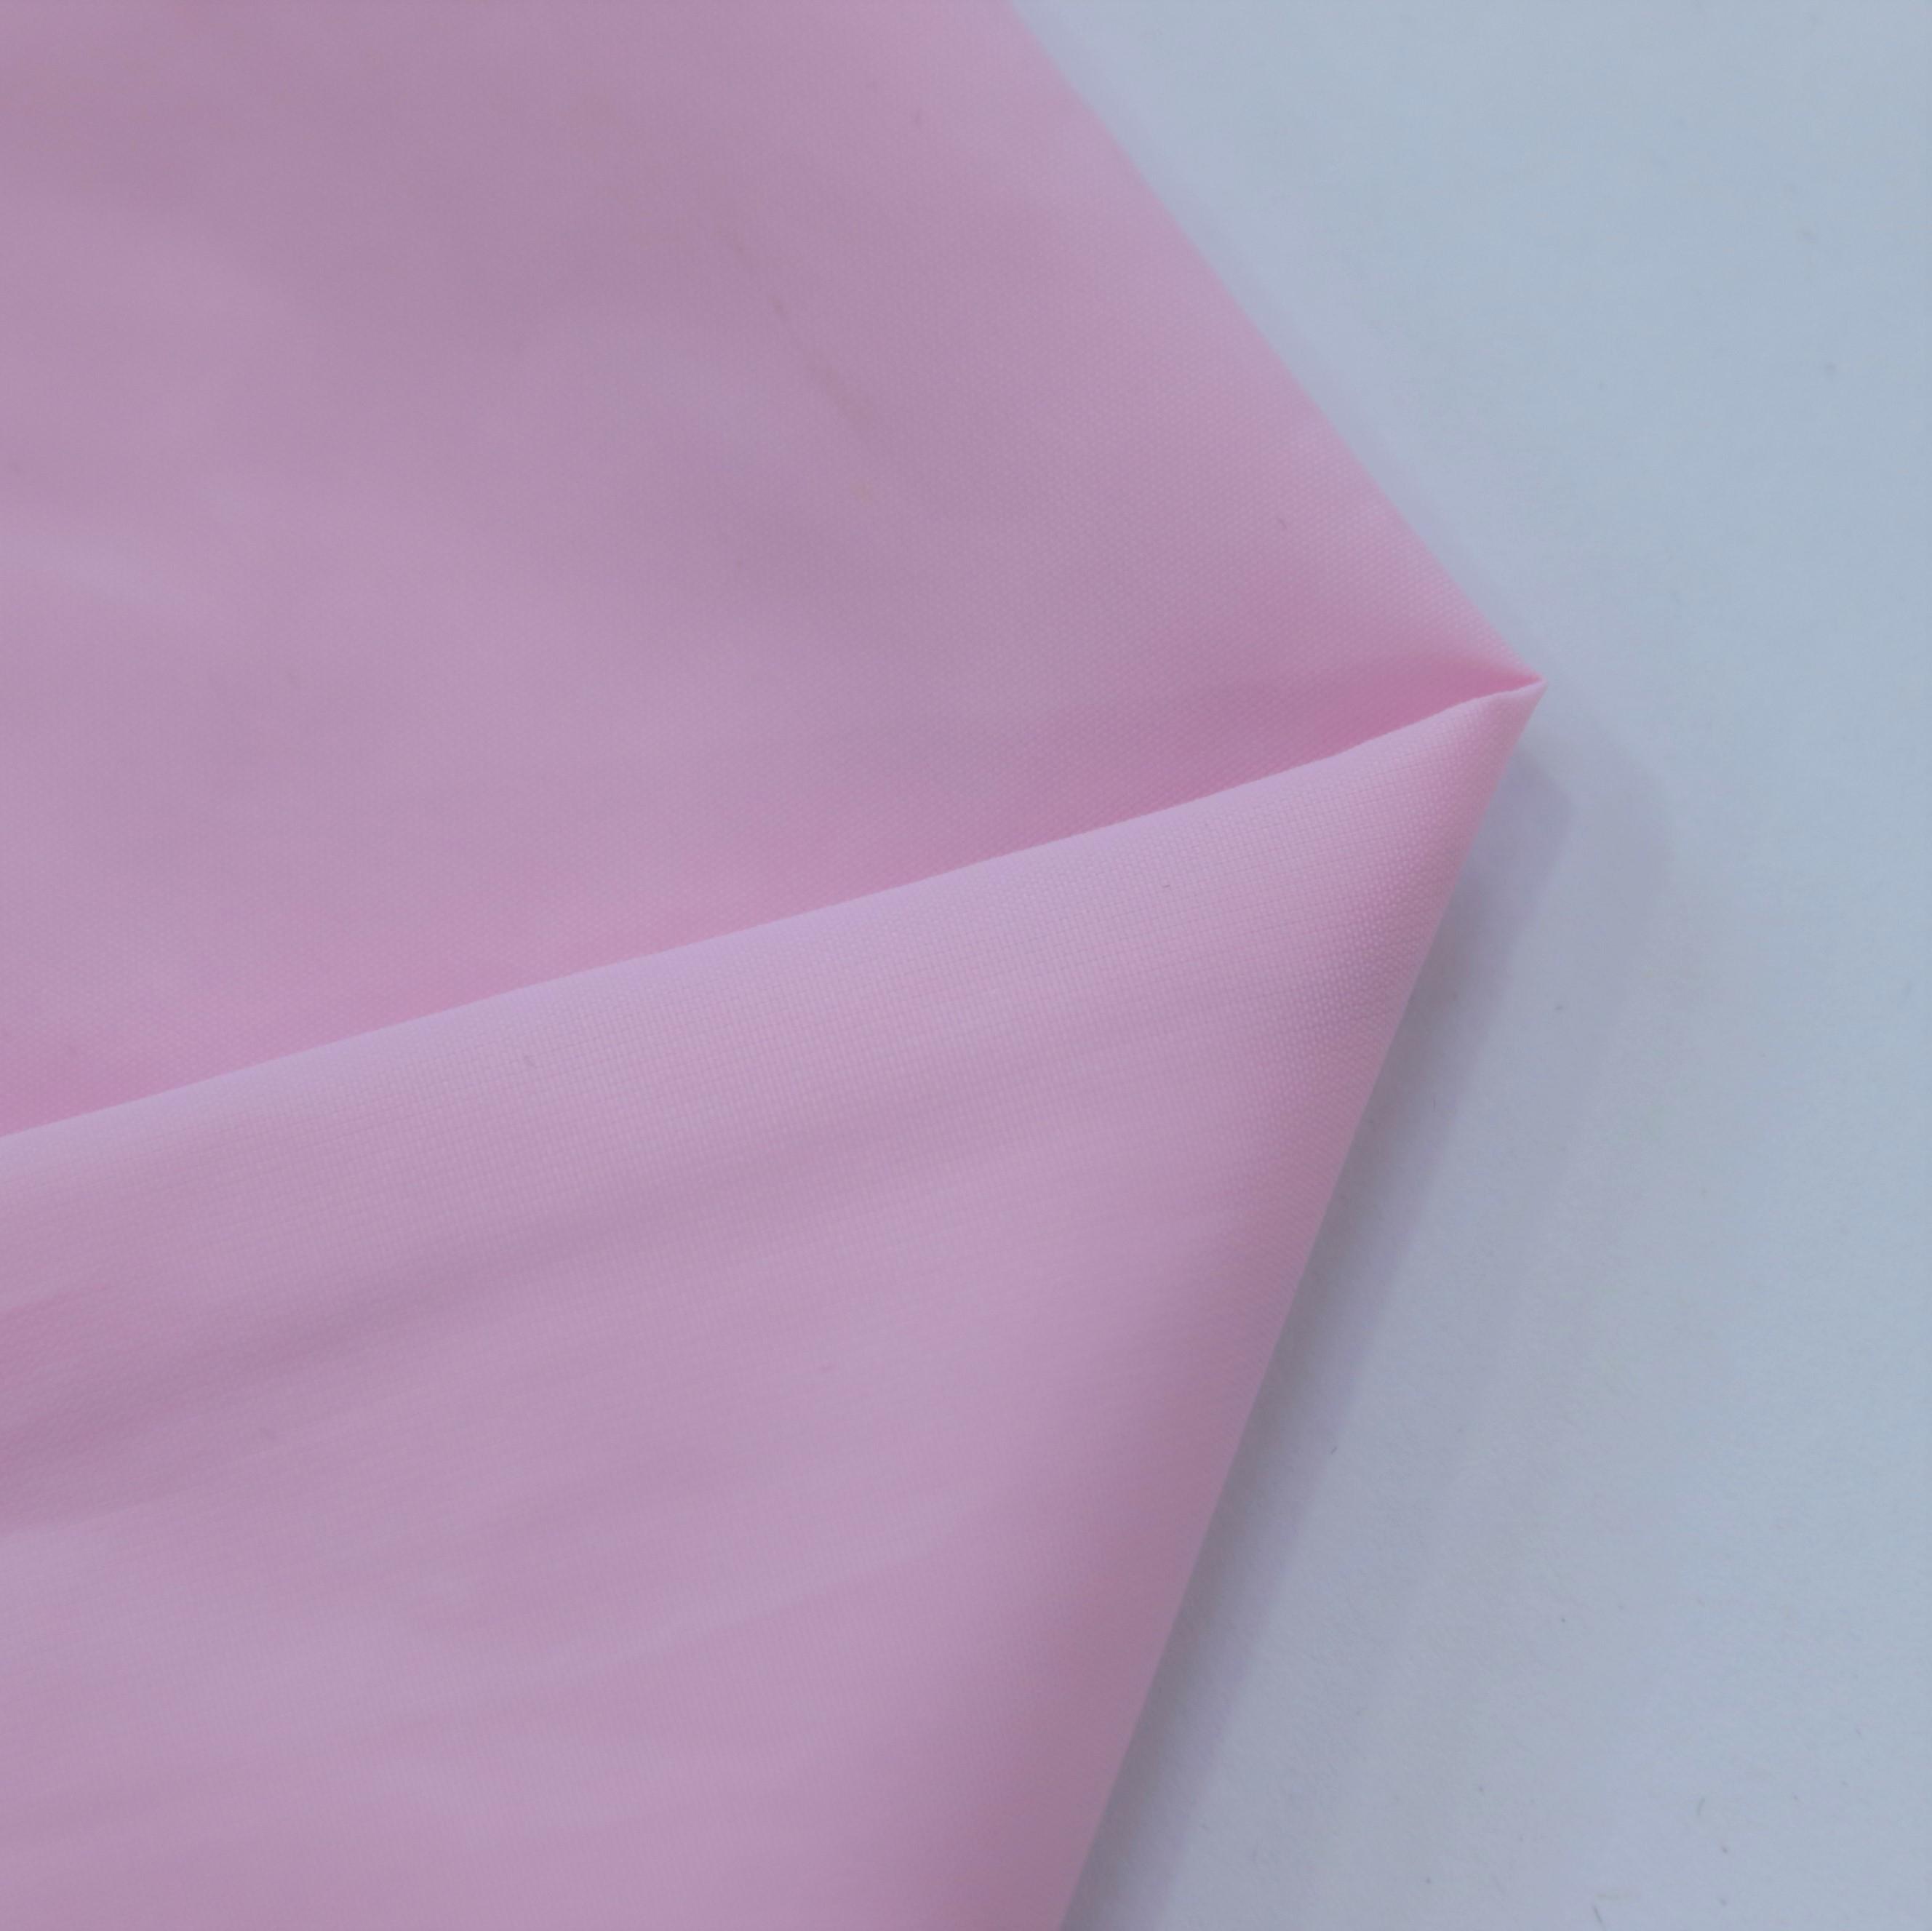 100%Nylon waterproof and downproof dull nylon Taffeta fabric for bags with symphony blu-ray pearl coating